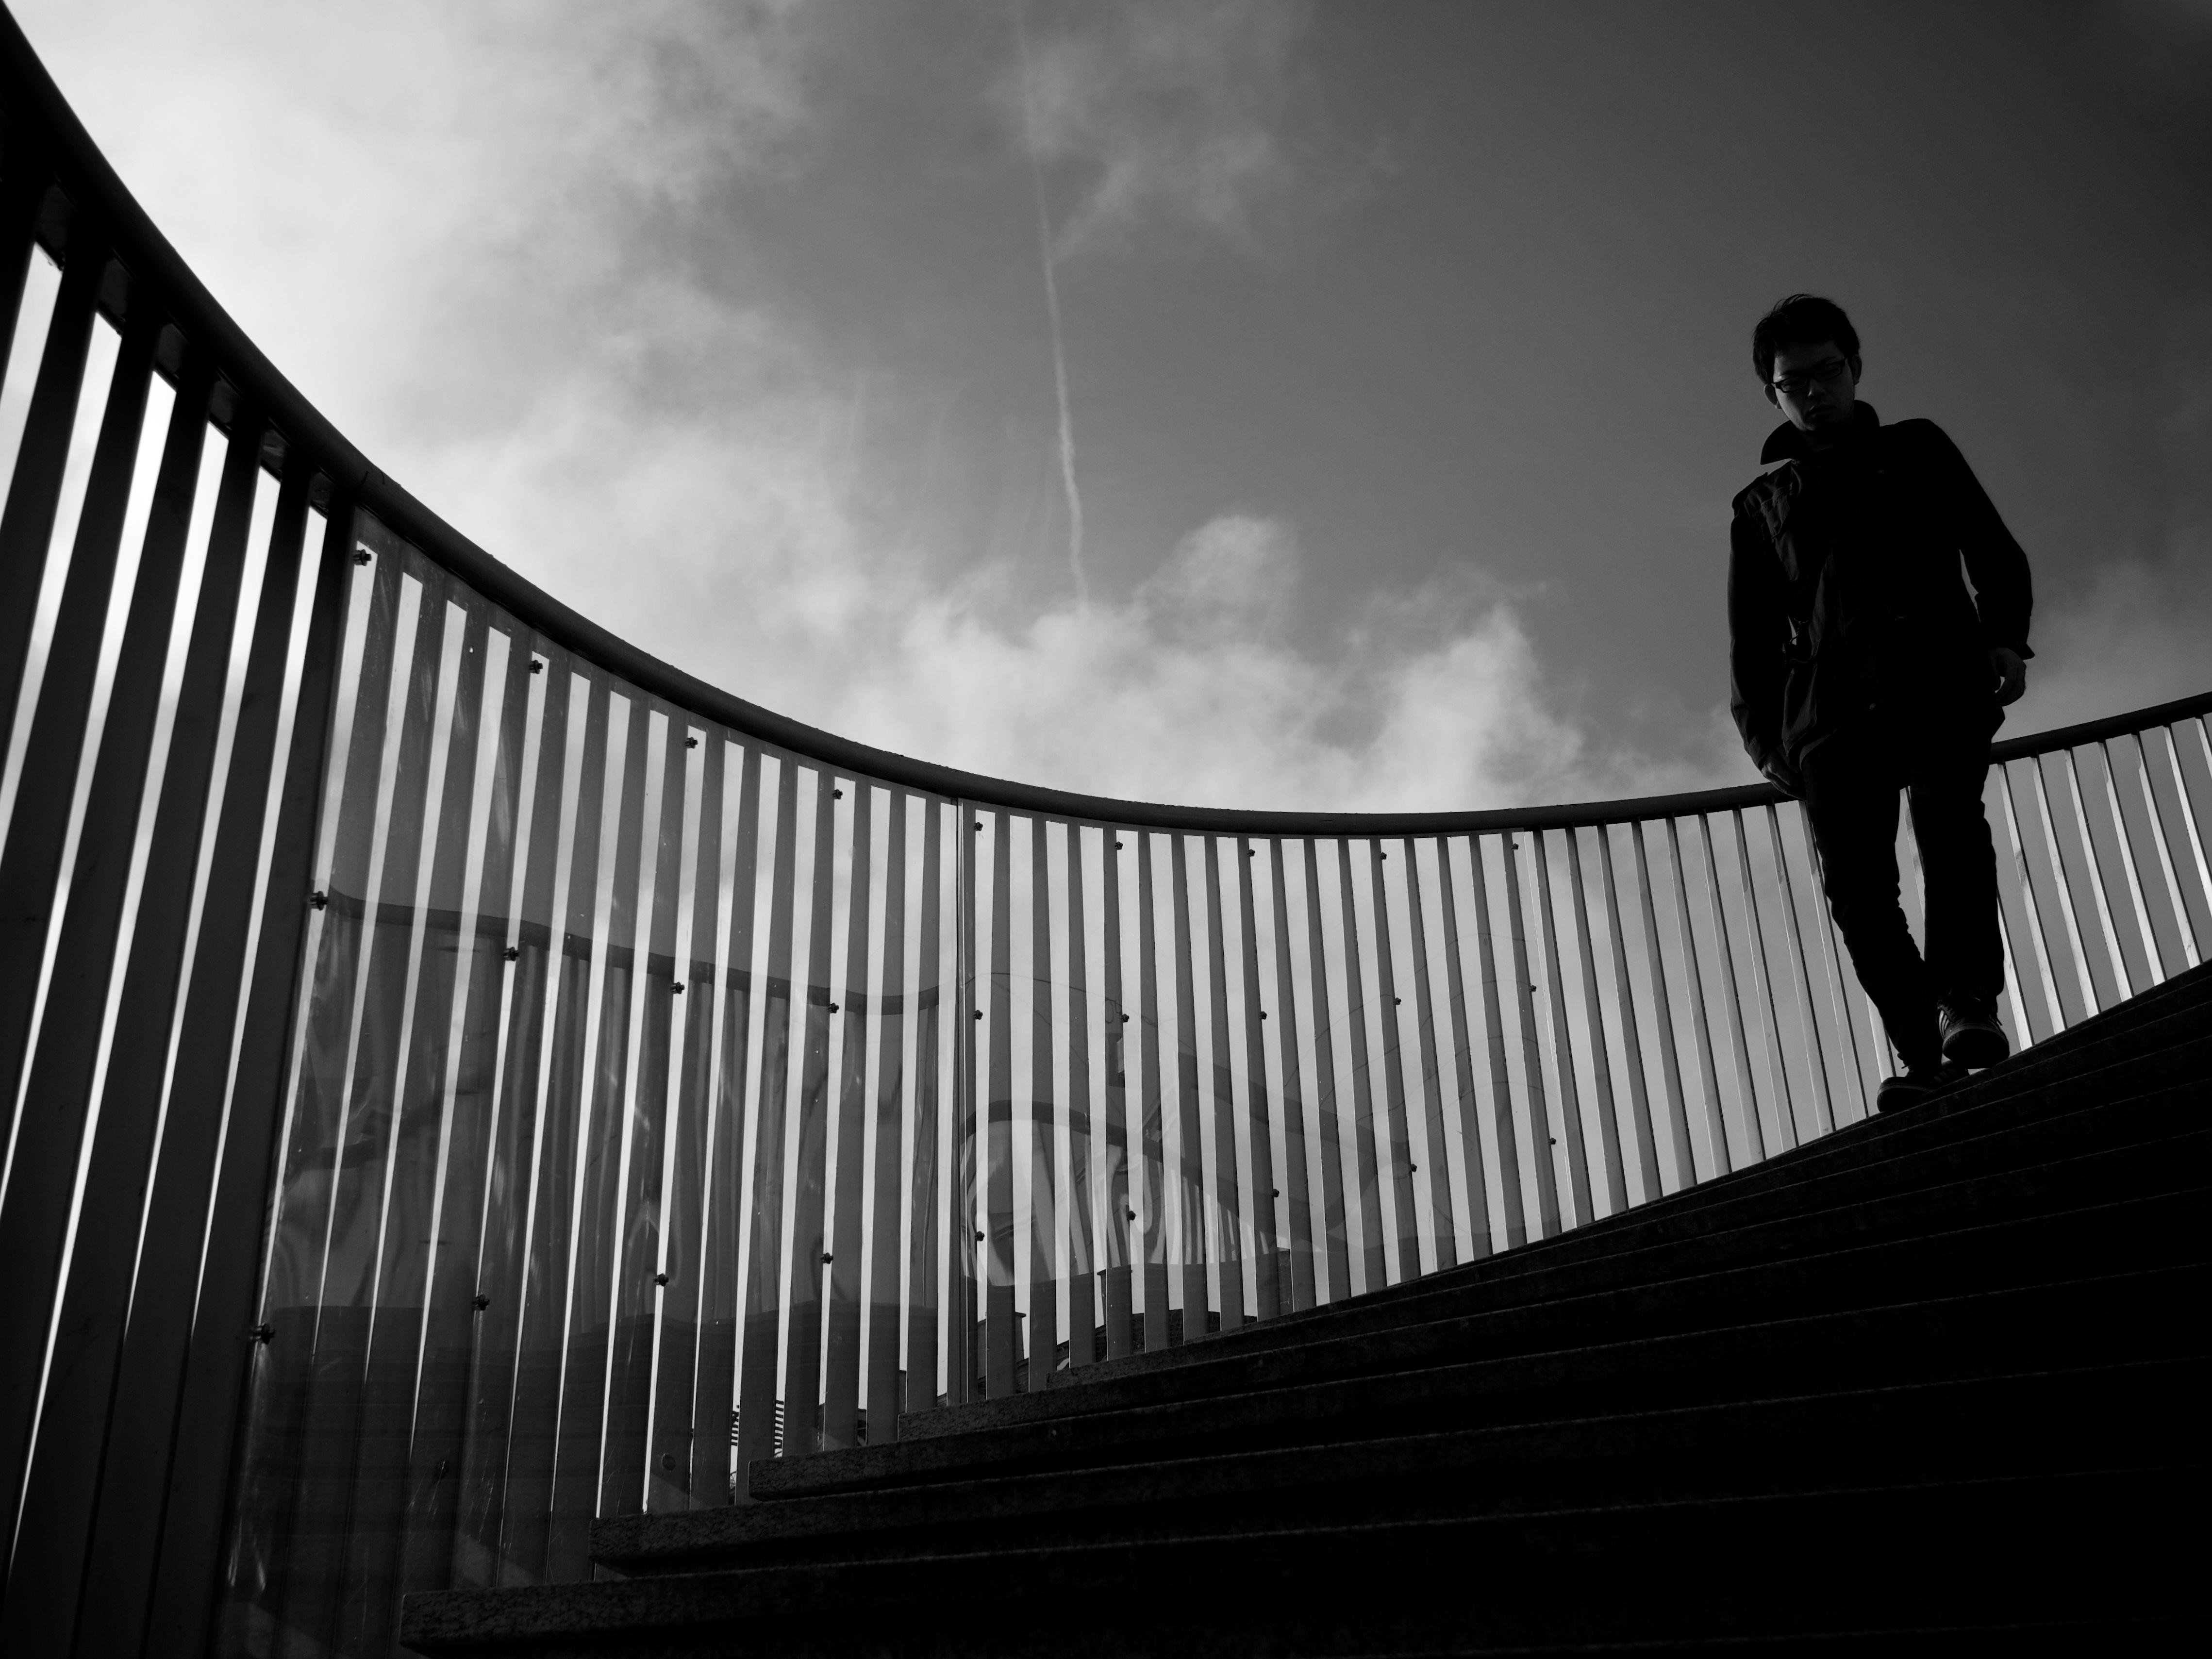 силуэт на лестнице в небо фото столько, что